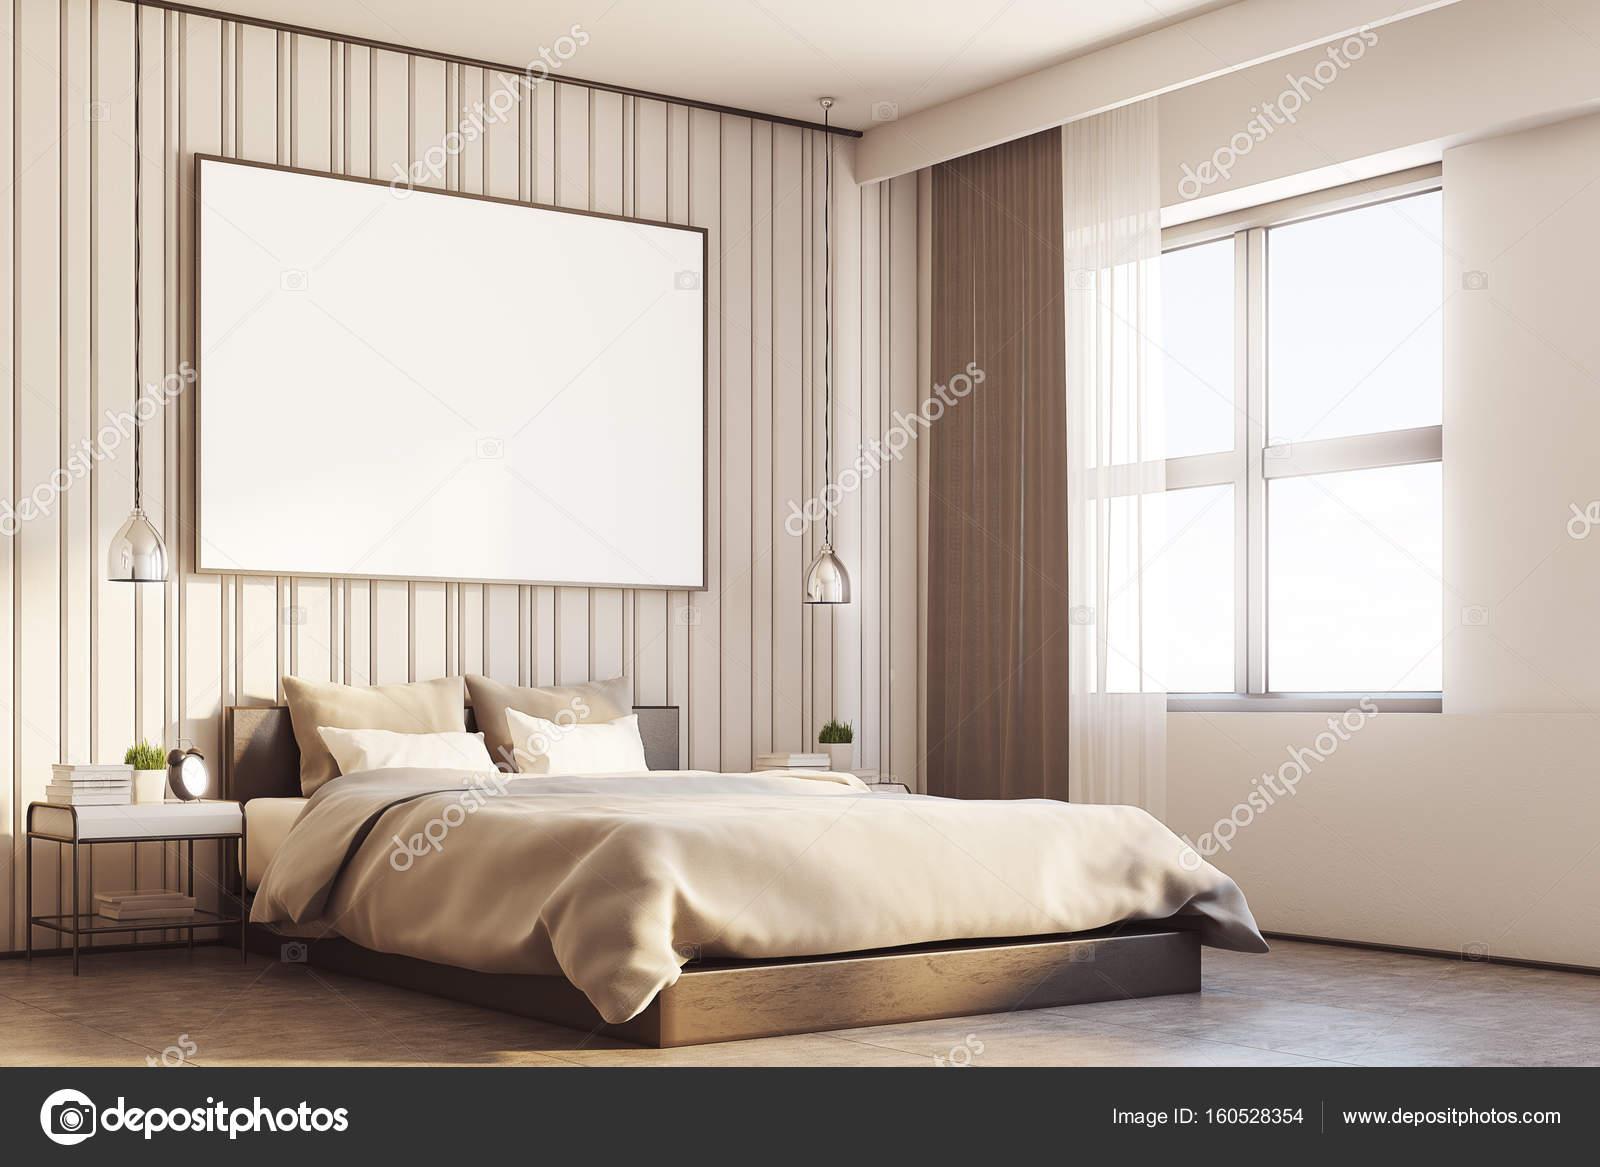 Grote Posters Slaapkamer : Beige slaapkamer met een grote poster kant u stockfoto